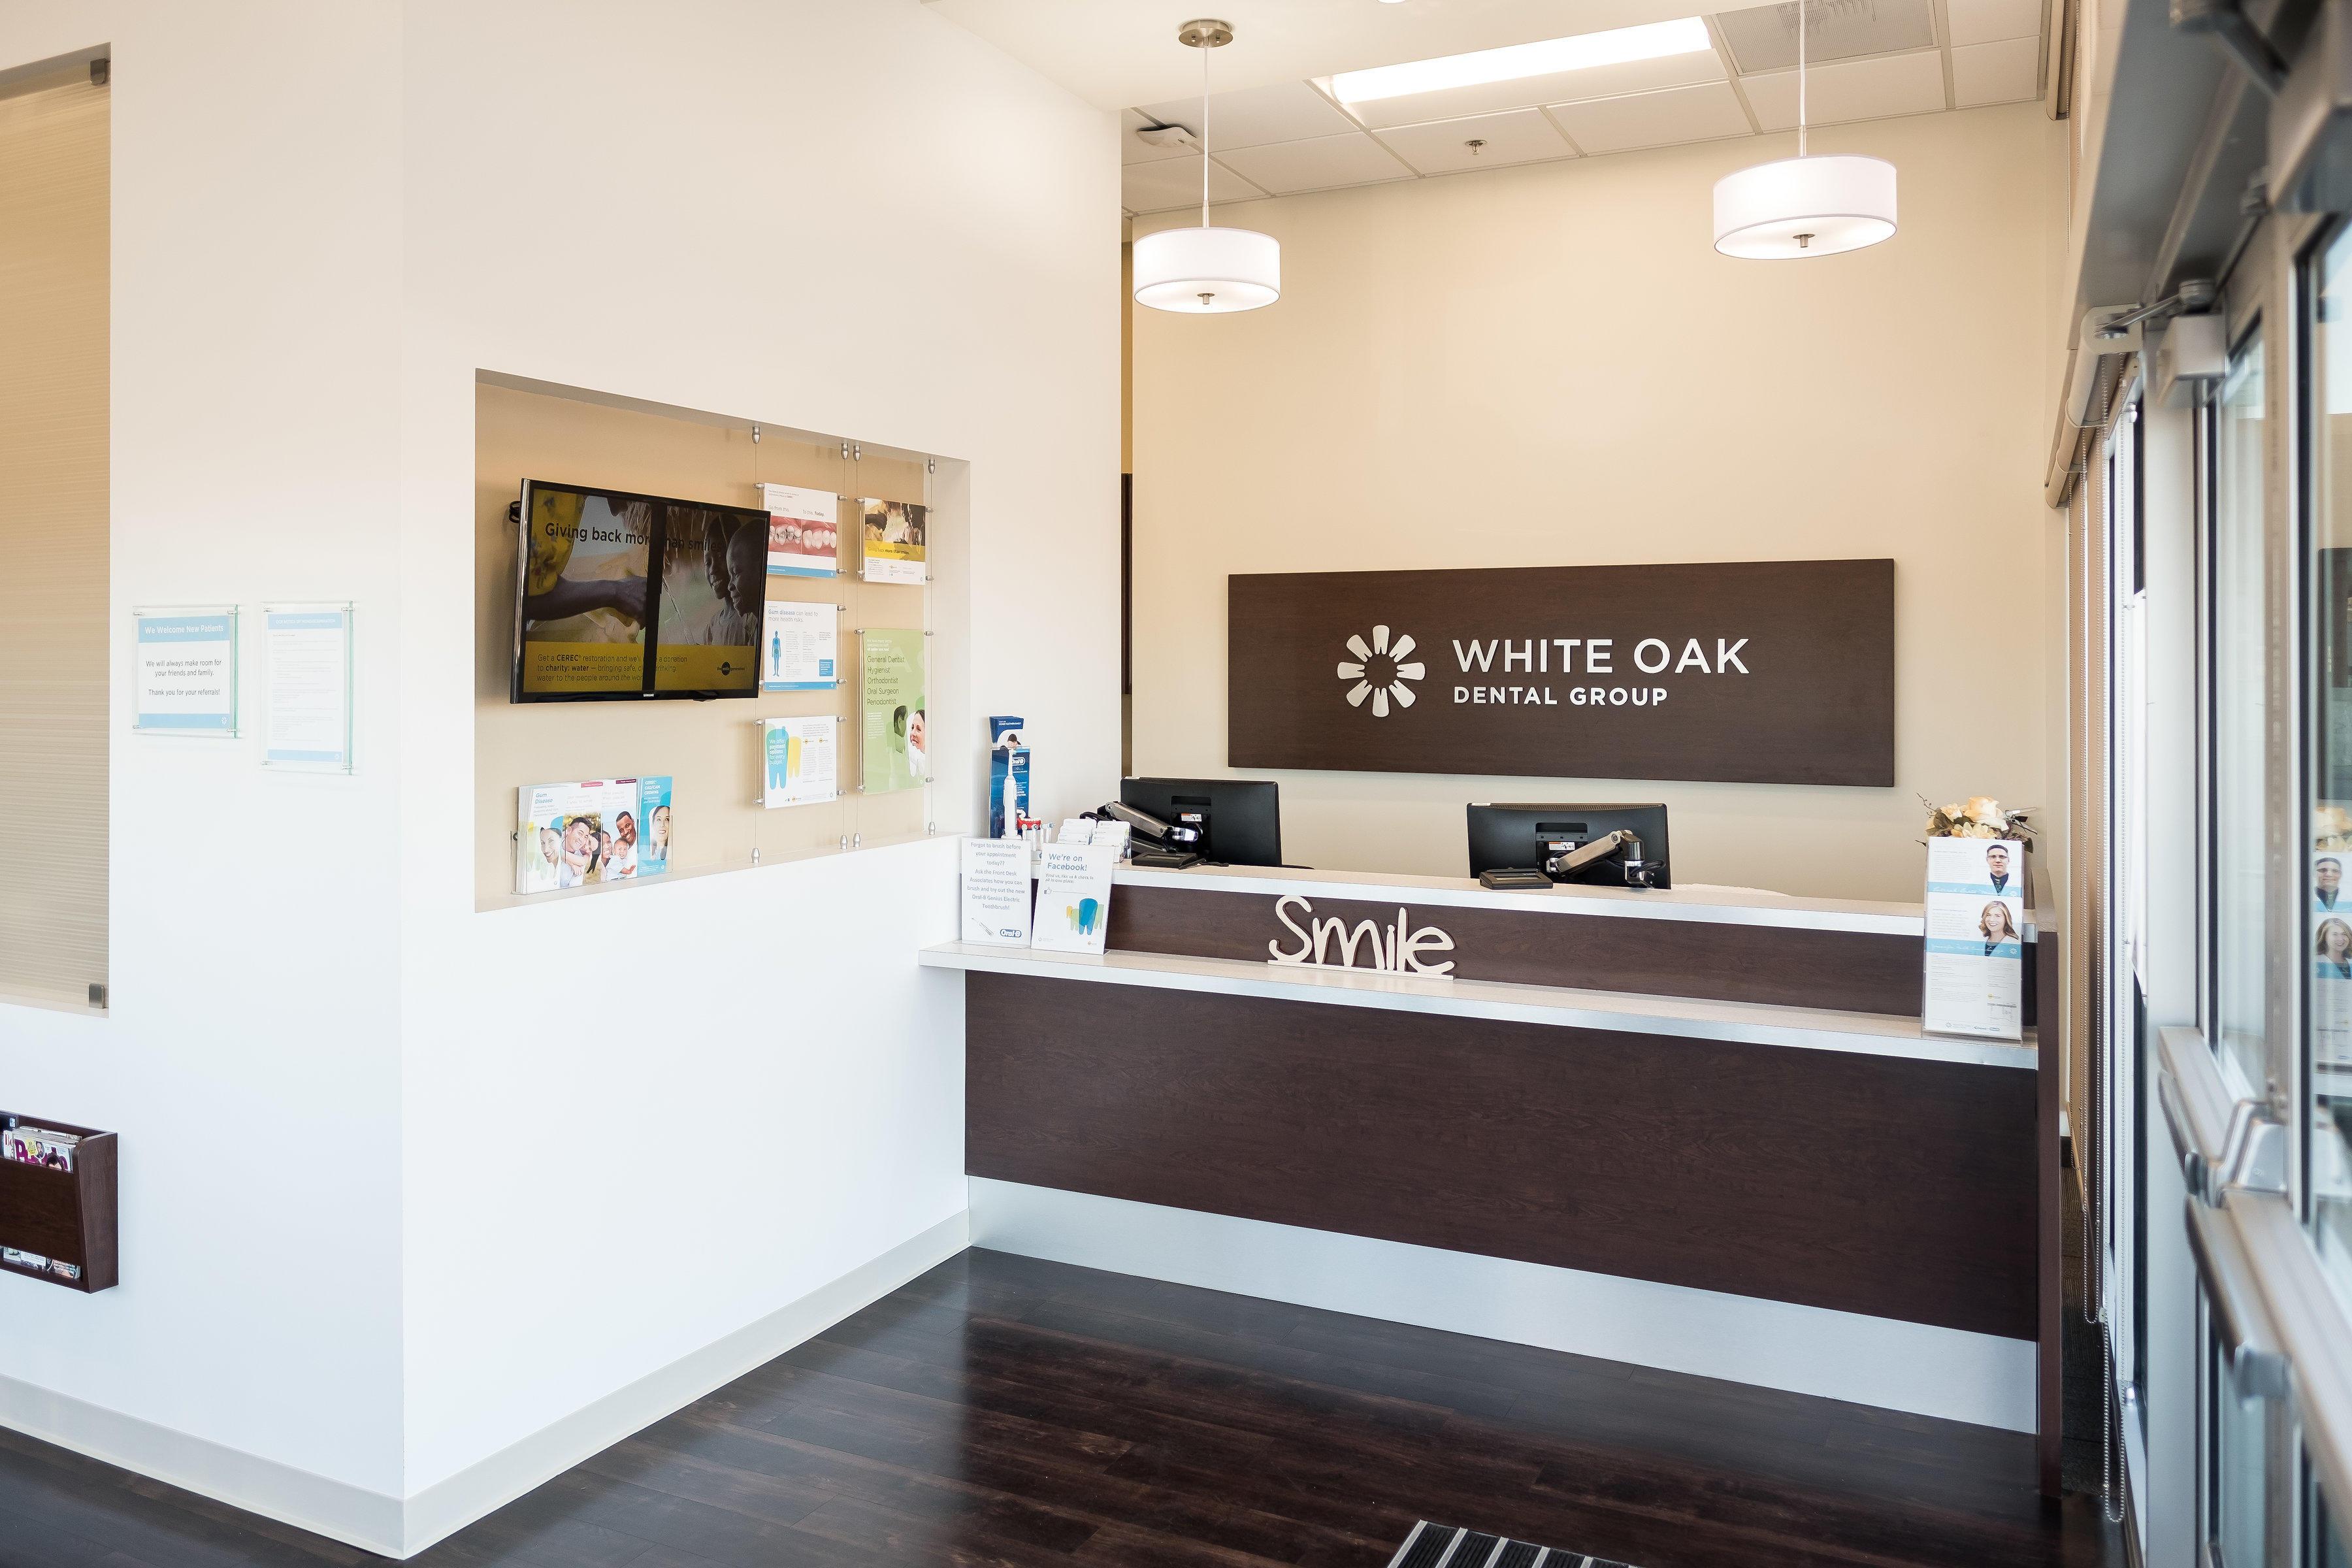 White Oak Dental Group image 9